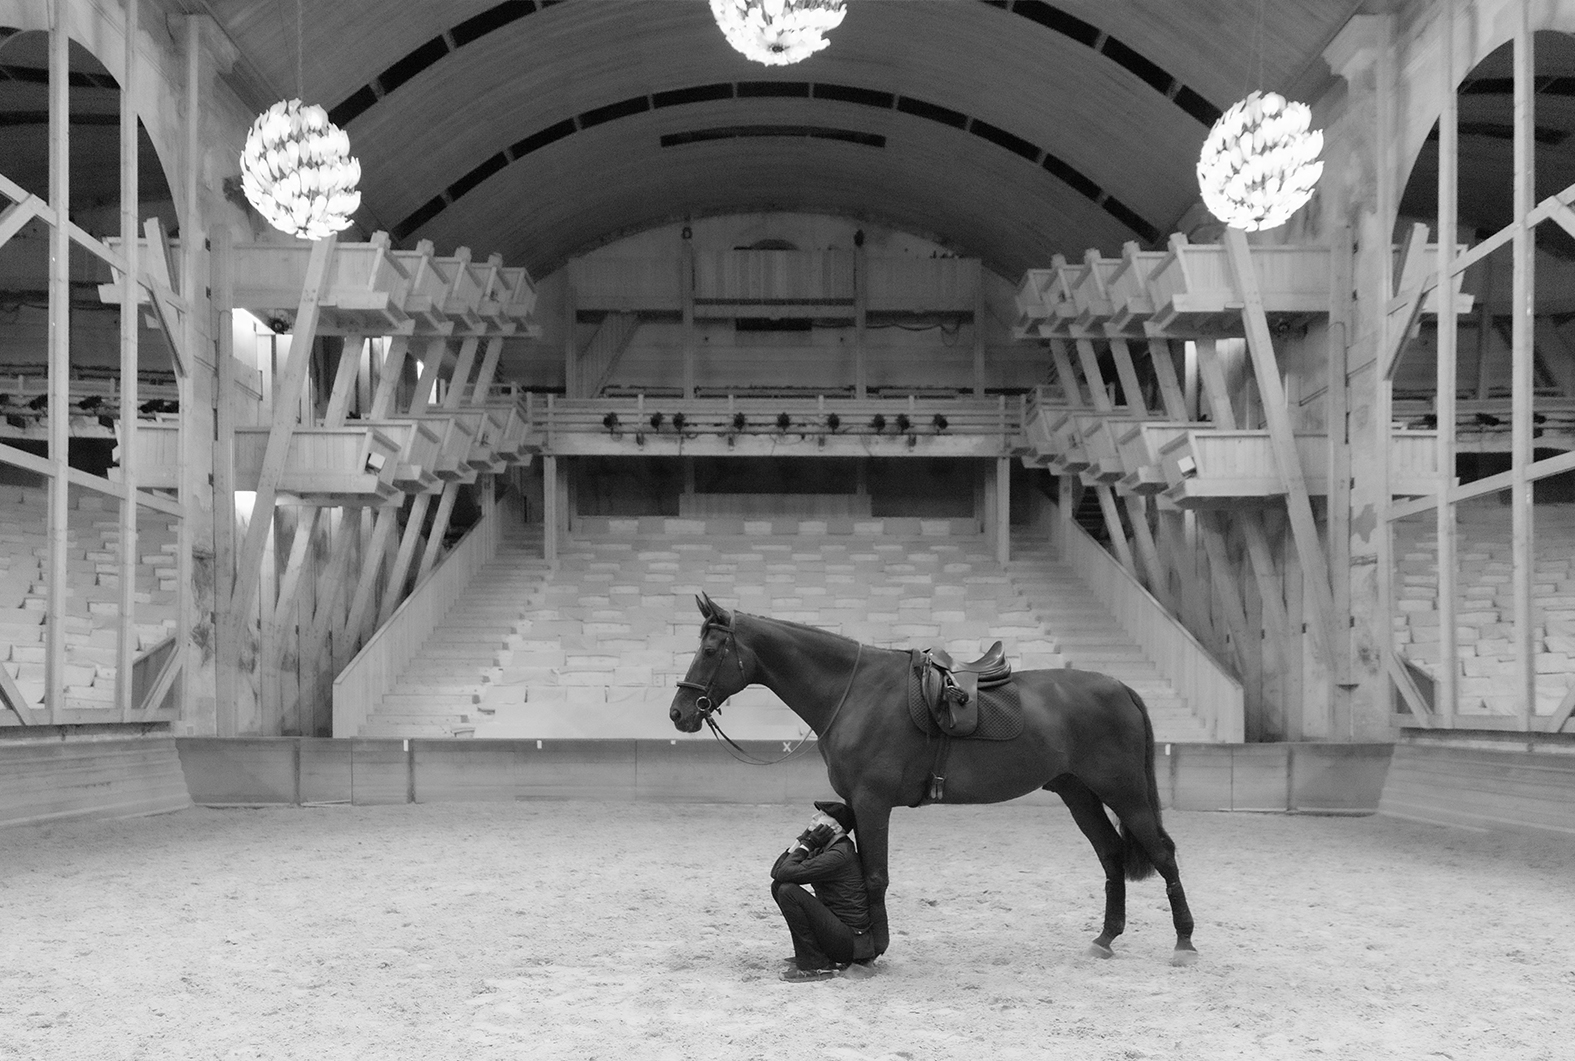 Entretiens silencieux, le nouveau solo de Bartabas avec son cheval Tsar